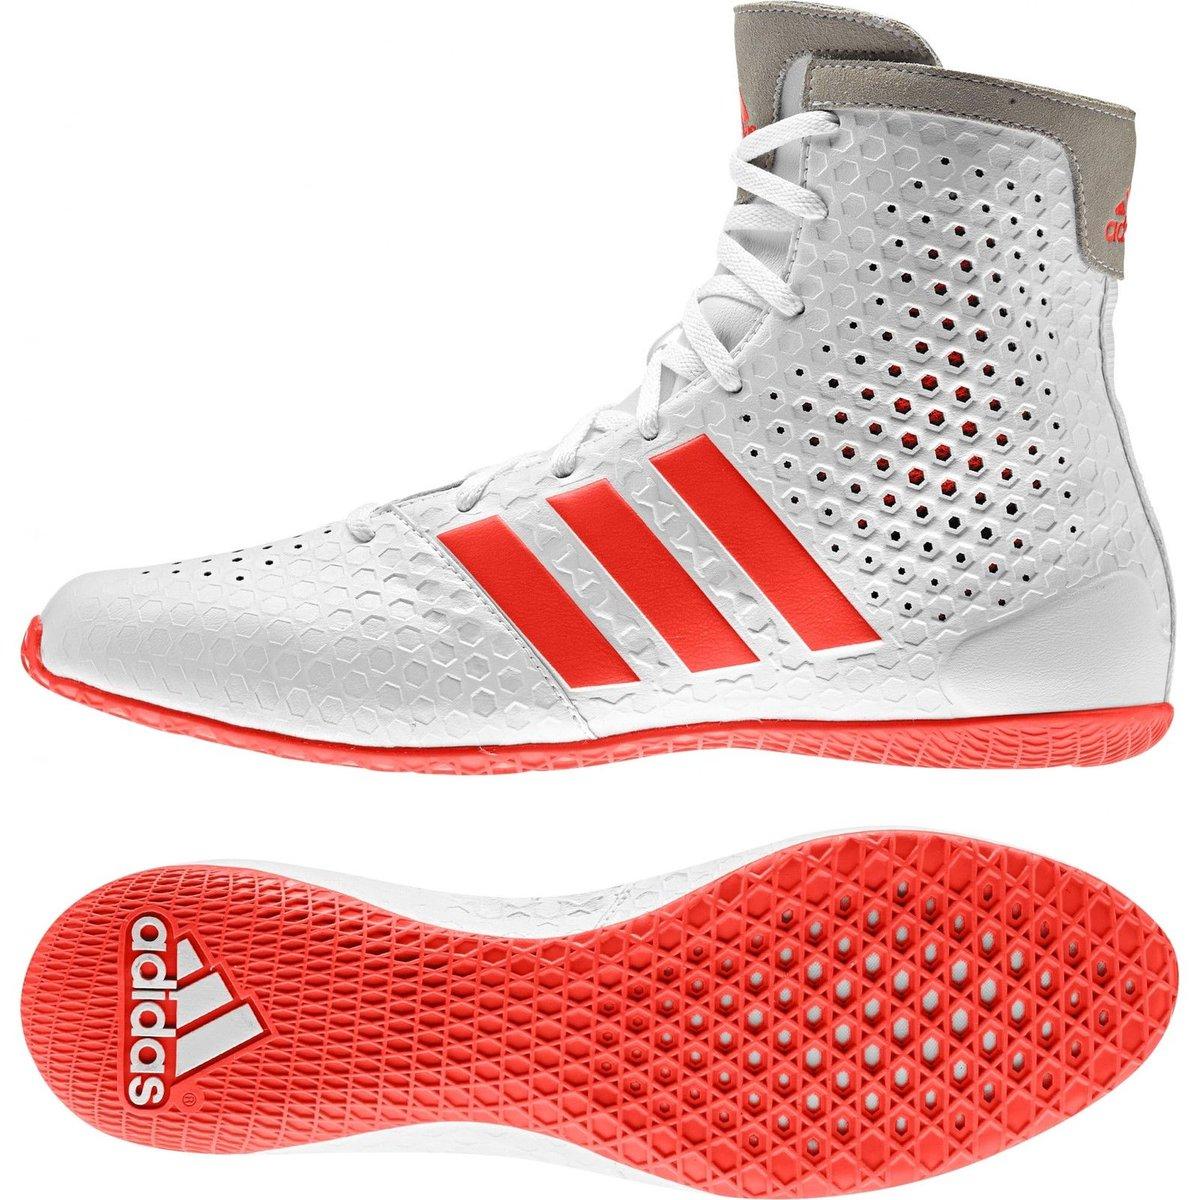 Adidas Tygun Boxing Shoes: Amazon.co.uk: Sports & Outdoors